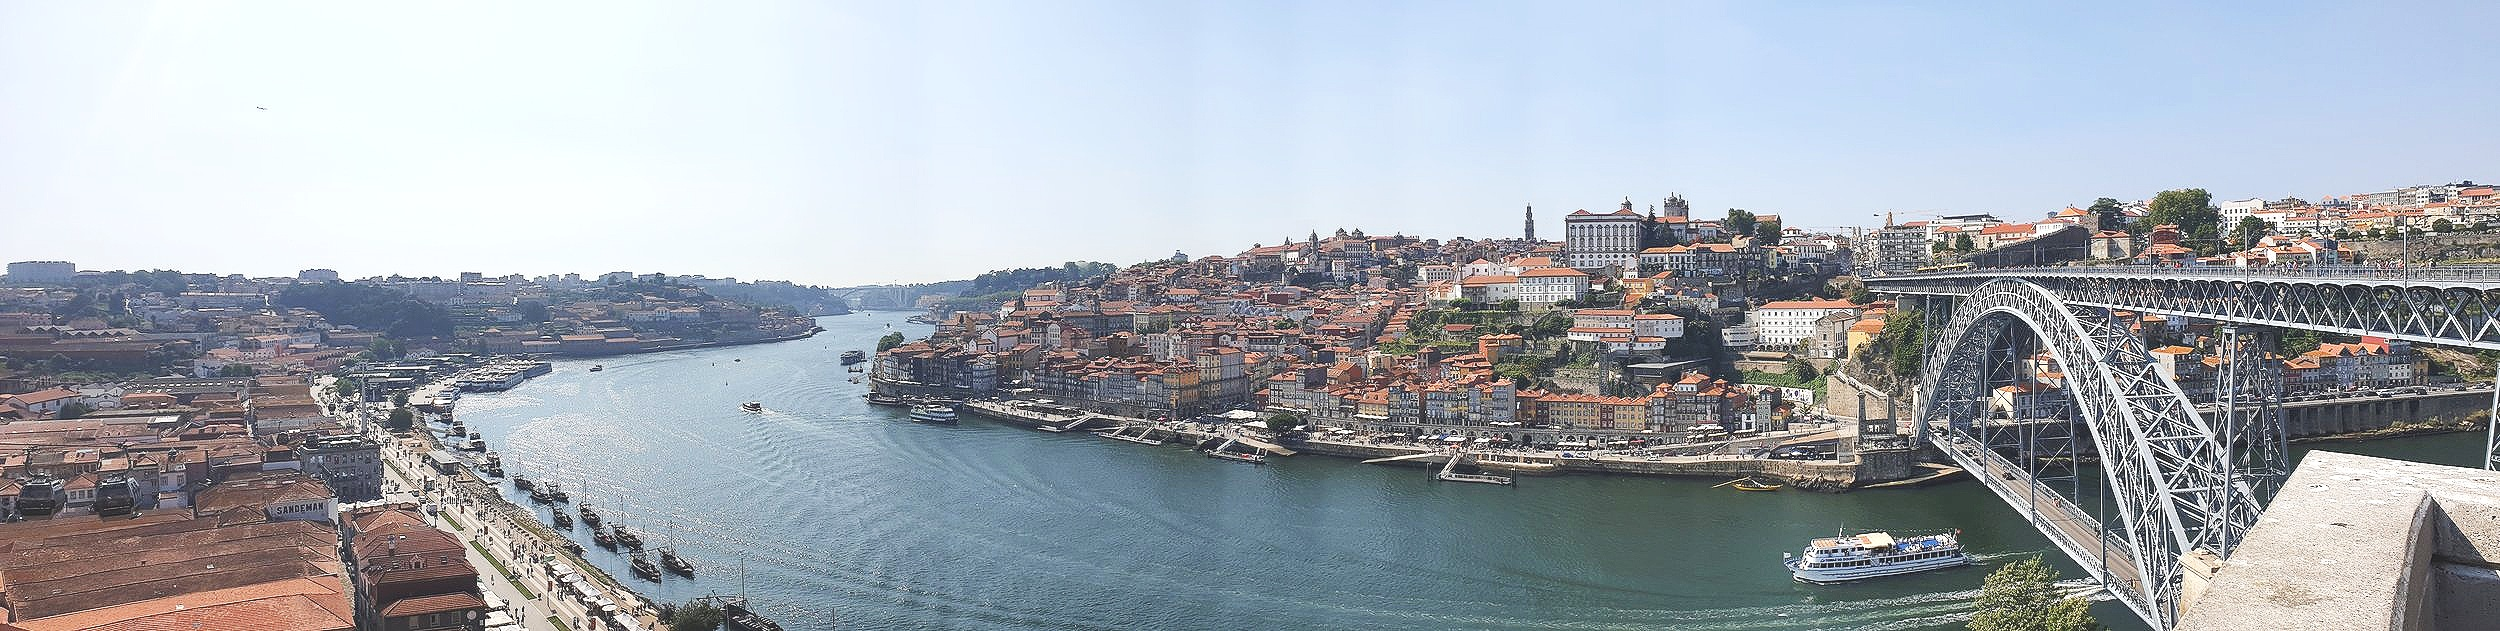 2019 Euroglia meeting @ Porto, Portugal